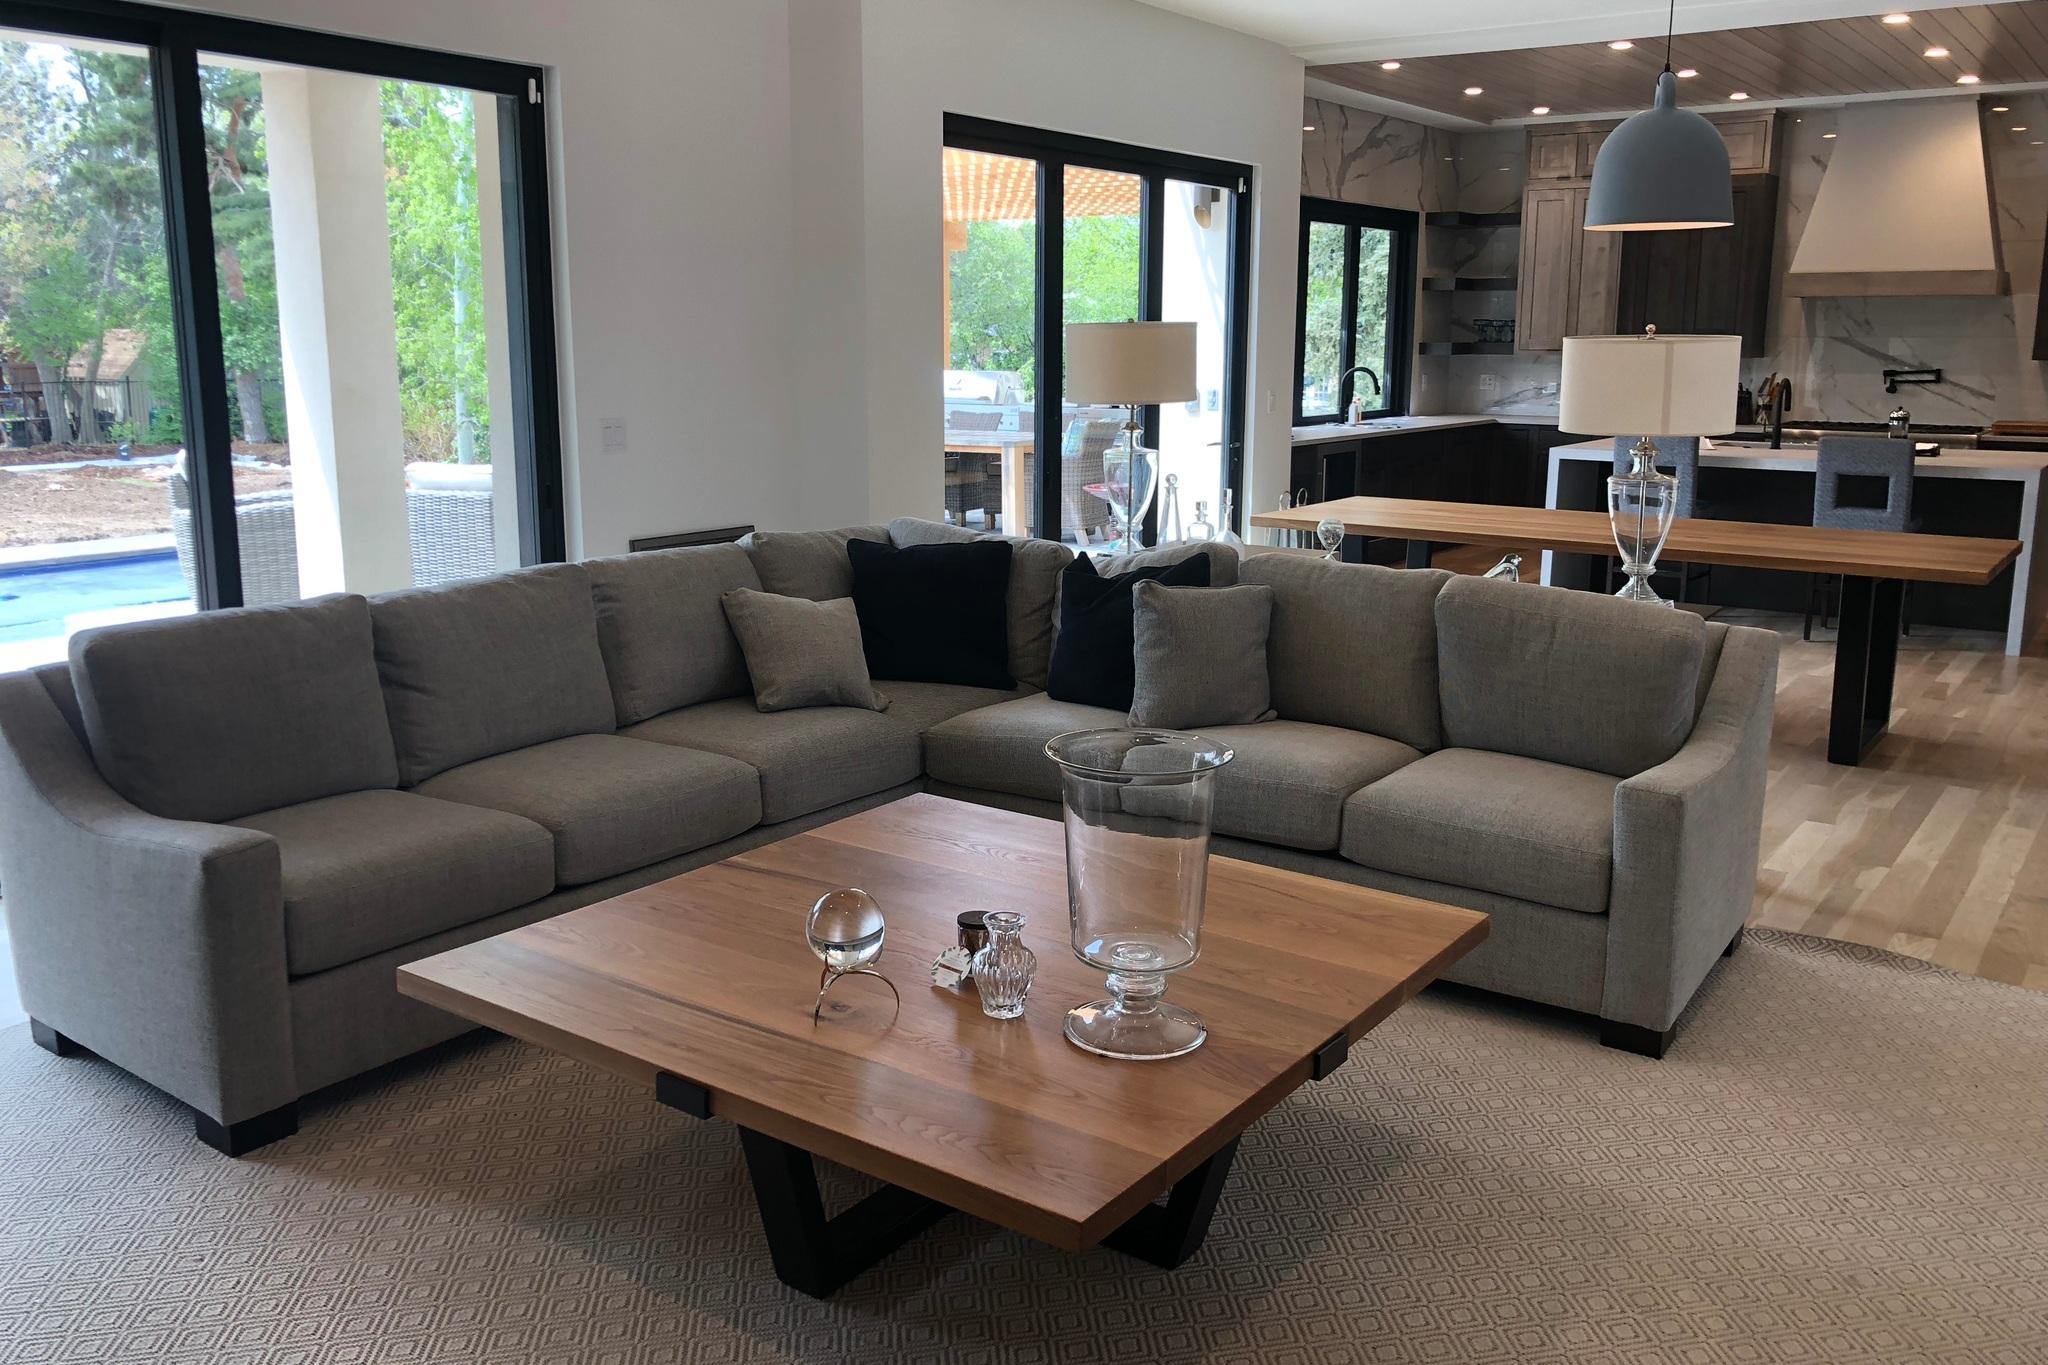 House+of+Alpine+White+Oak+Coffee+Table.jpg